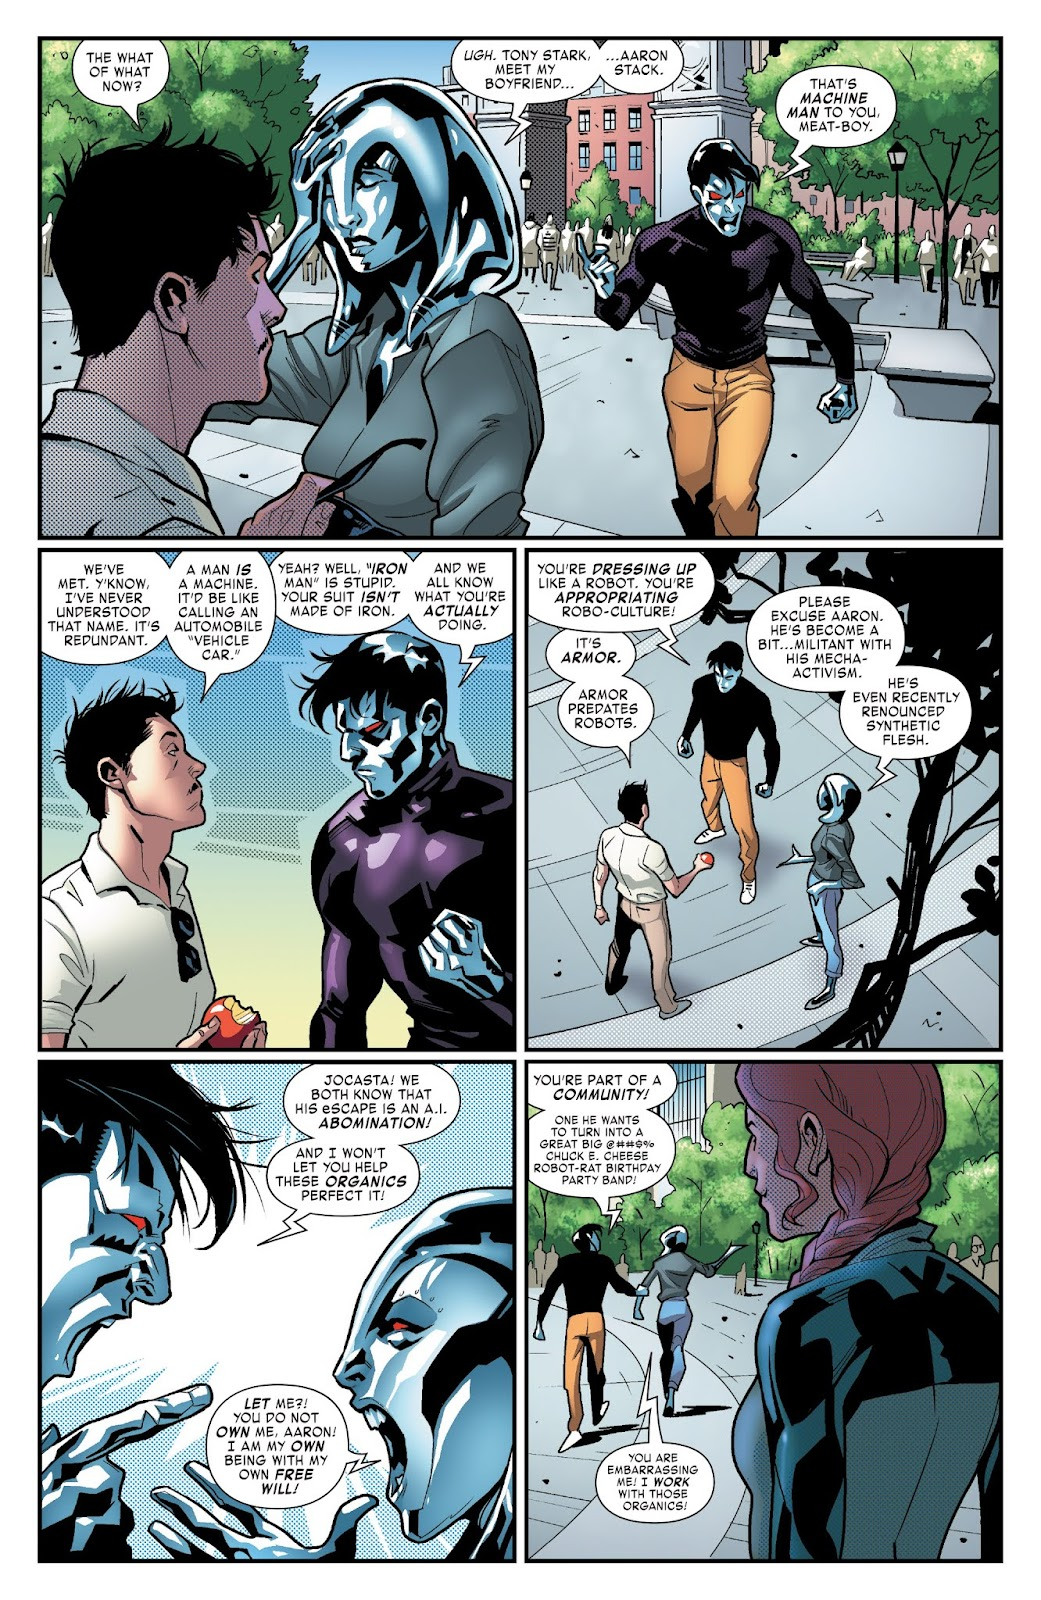 Read online Tony Stark: Iron Man comic -  Issue #3 - 8